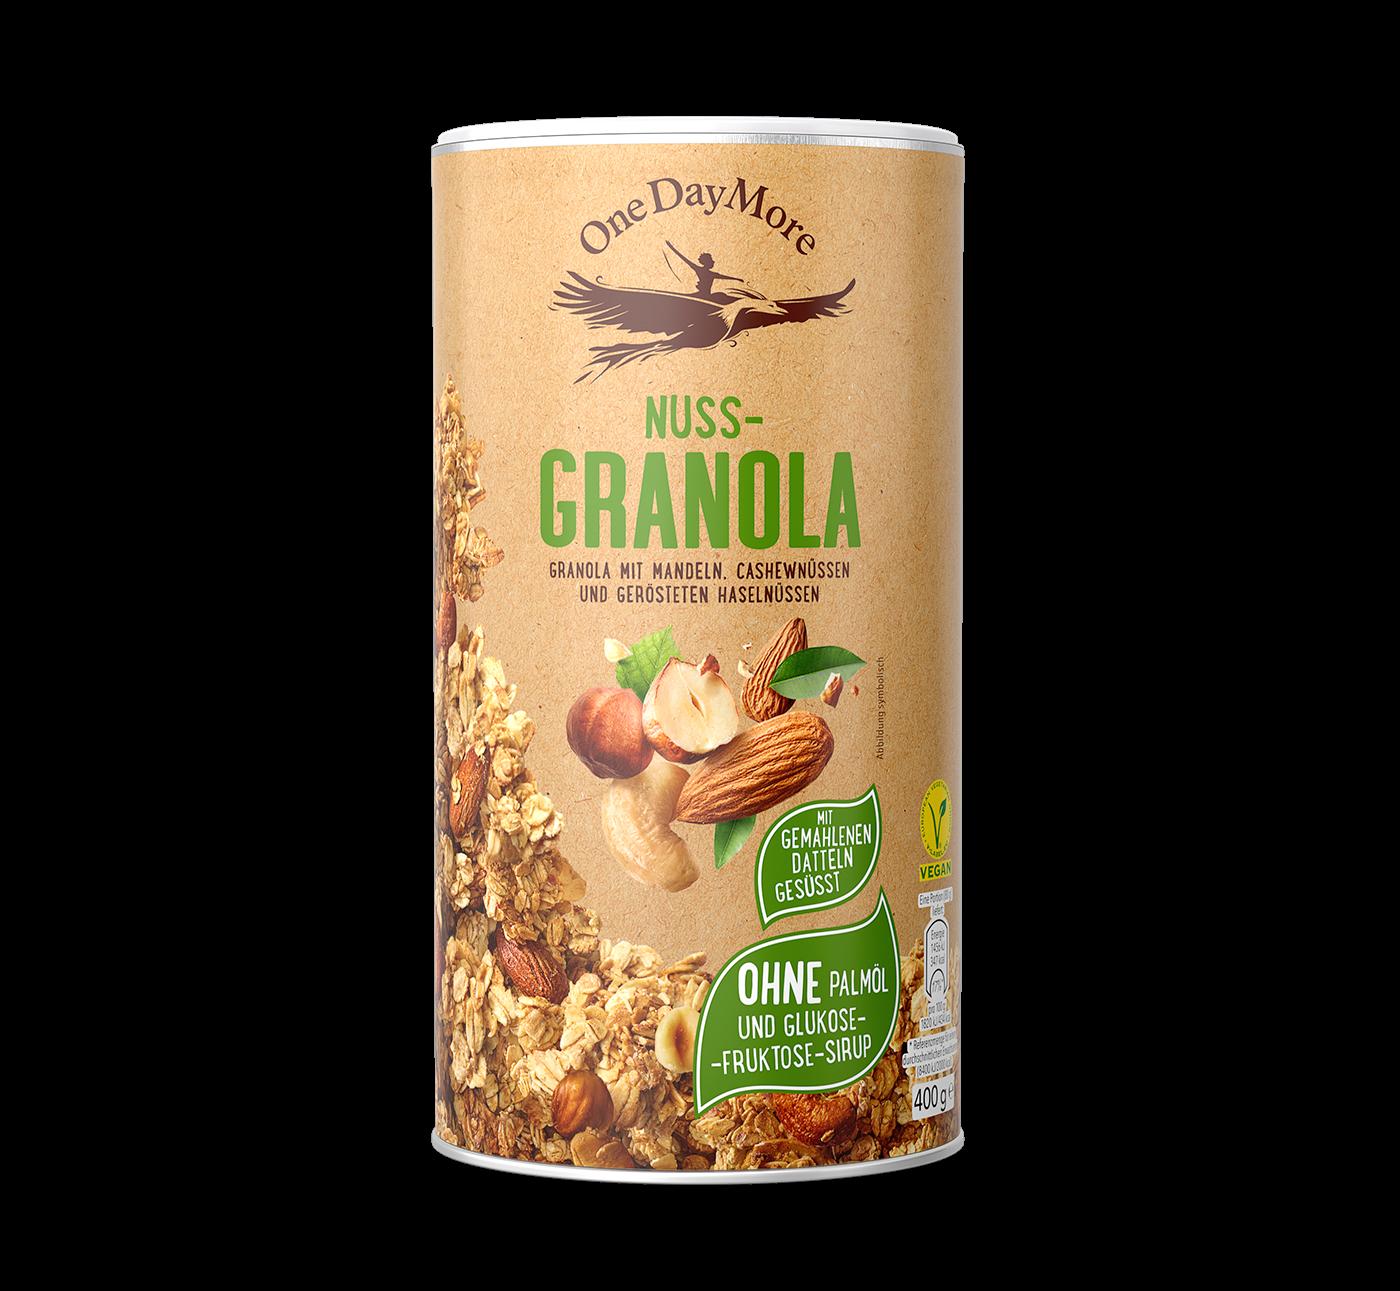 nuss-granola-onedaymore-front-tuba-1400×1291